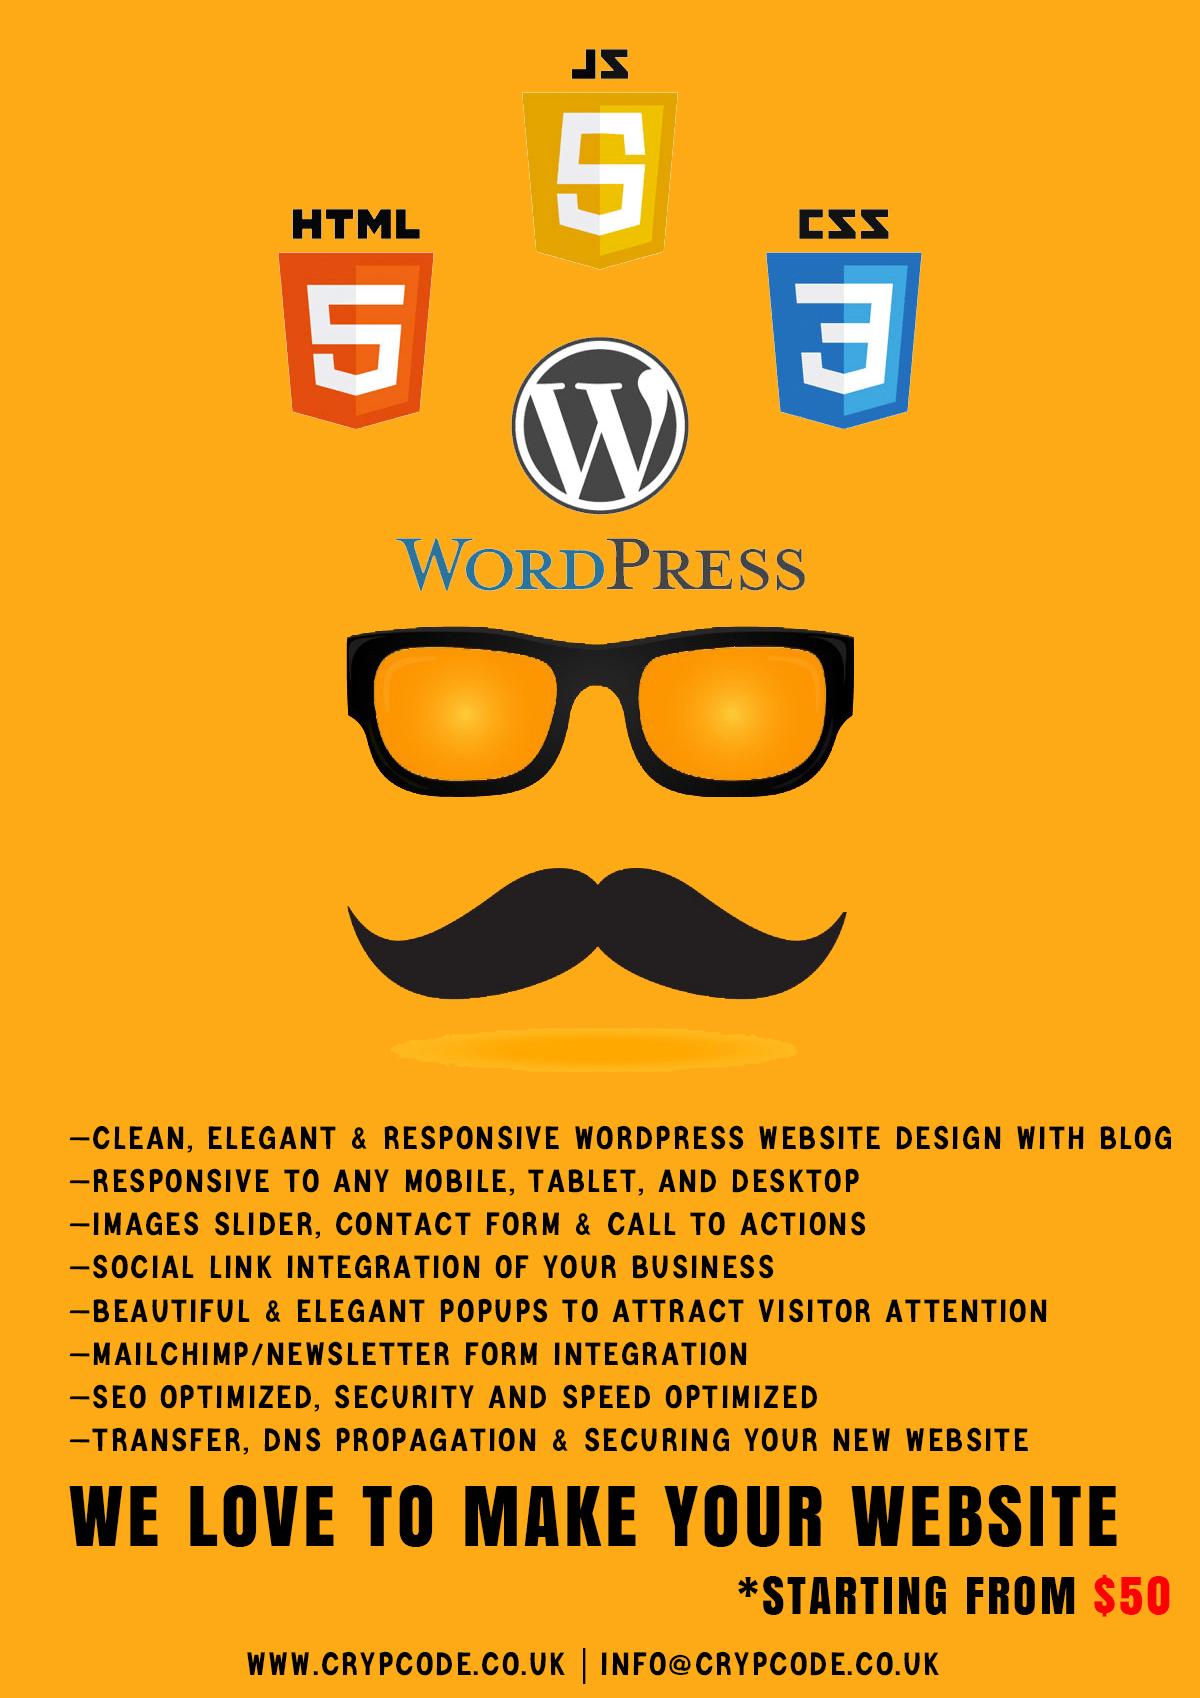 I will create a mind blowing wordpress website